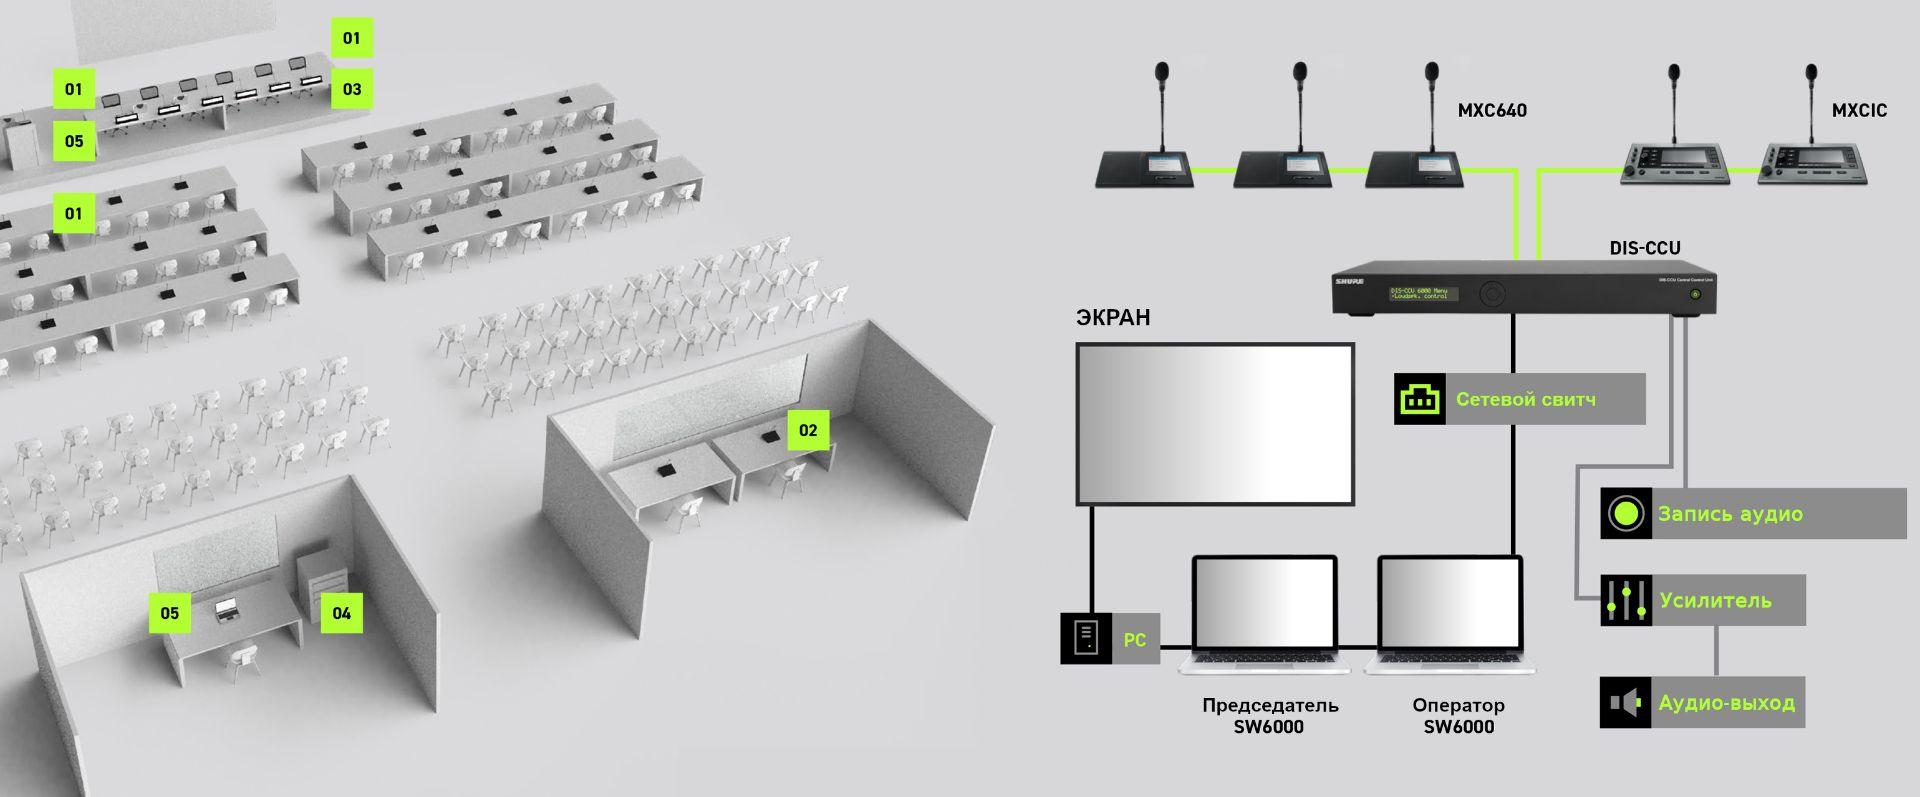 Конфигурация Shure Microflex Complete